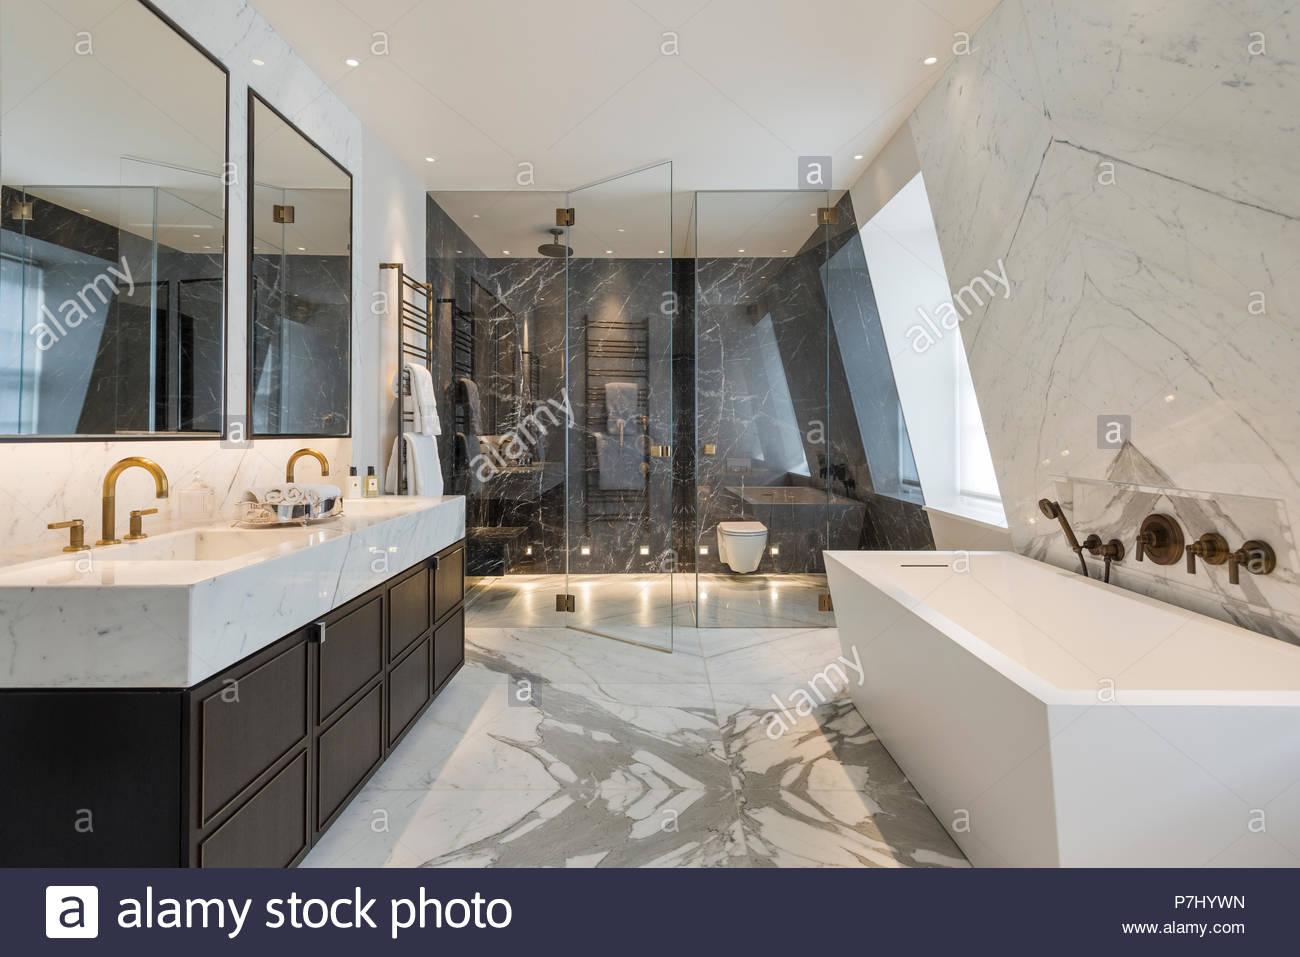 Badezimmer im Art déco-Stil Stockfoto, Bild: 211222081 - Alamy